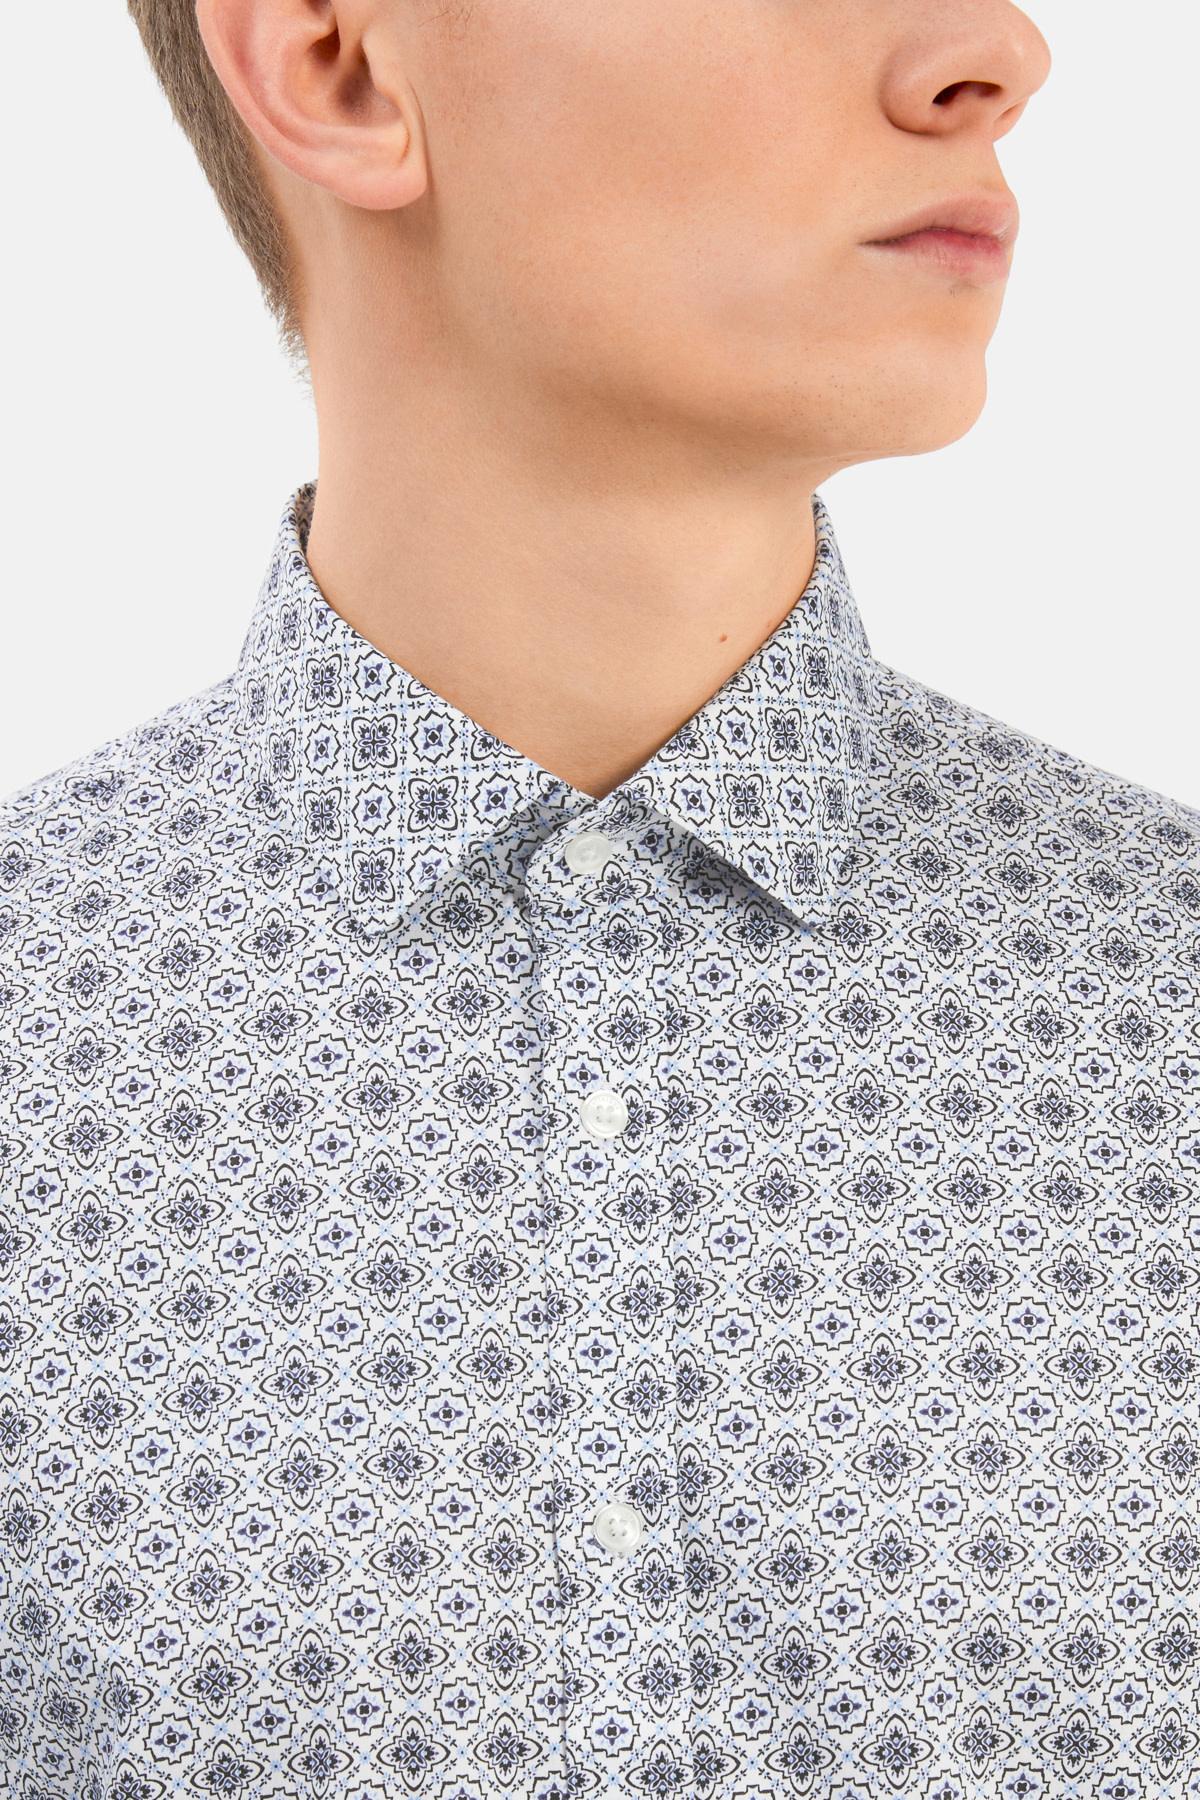 Mens Dress Shirt - Navy Antique Rosettes